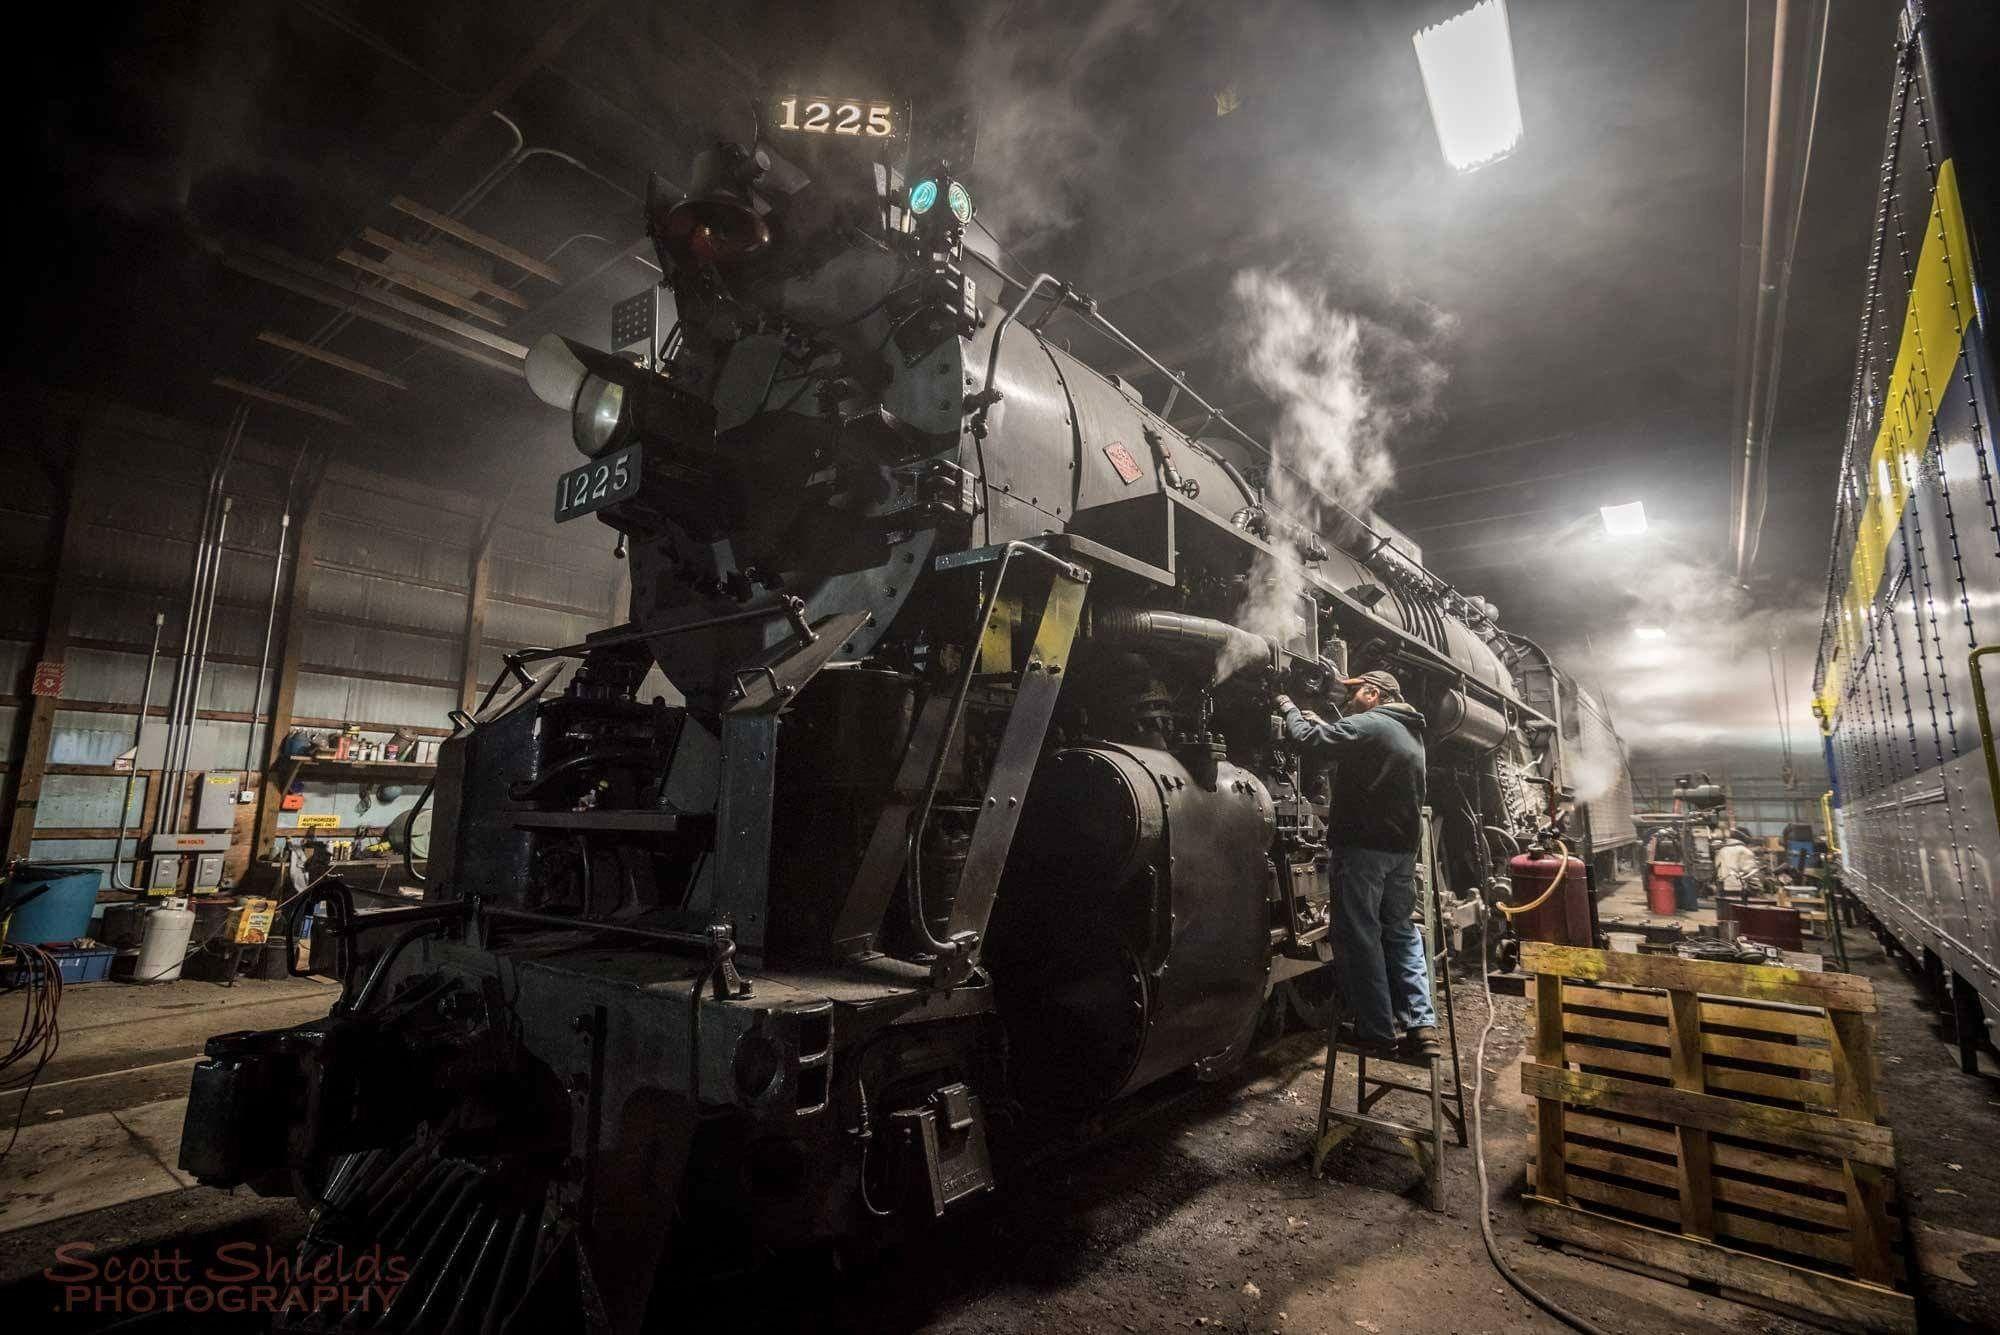 1225 steam locomotive, night shift.